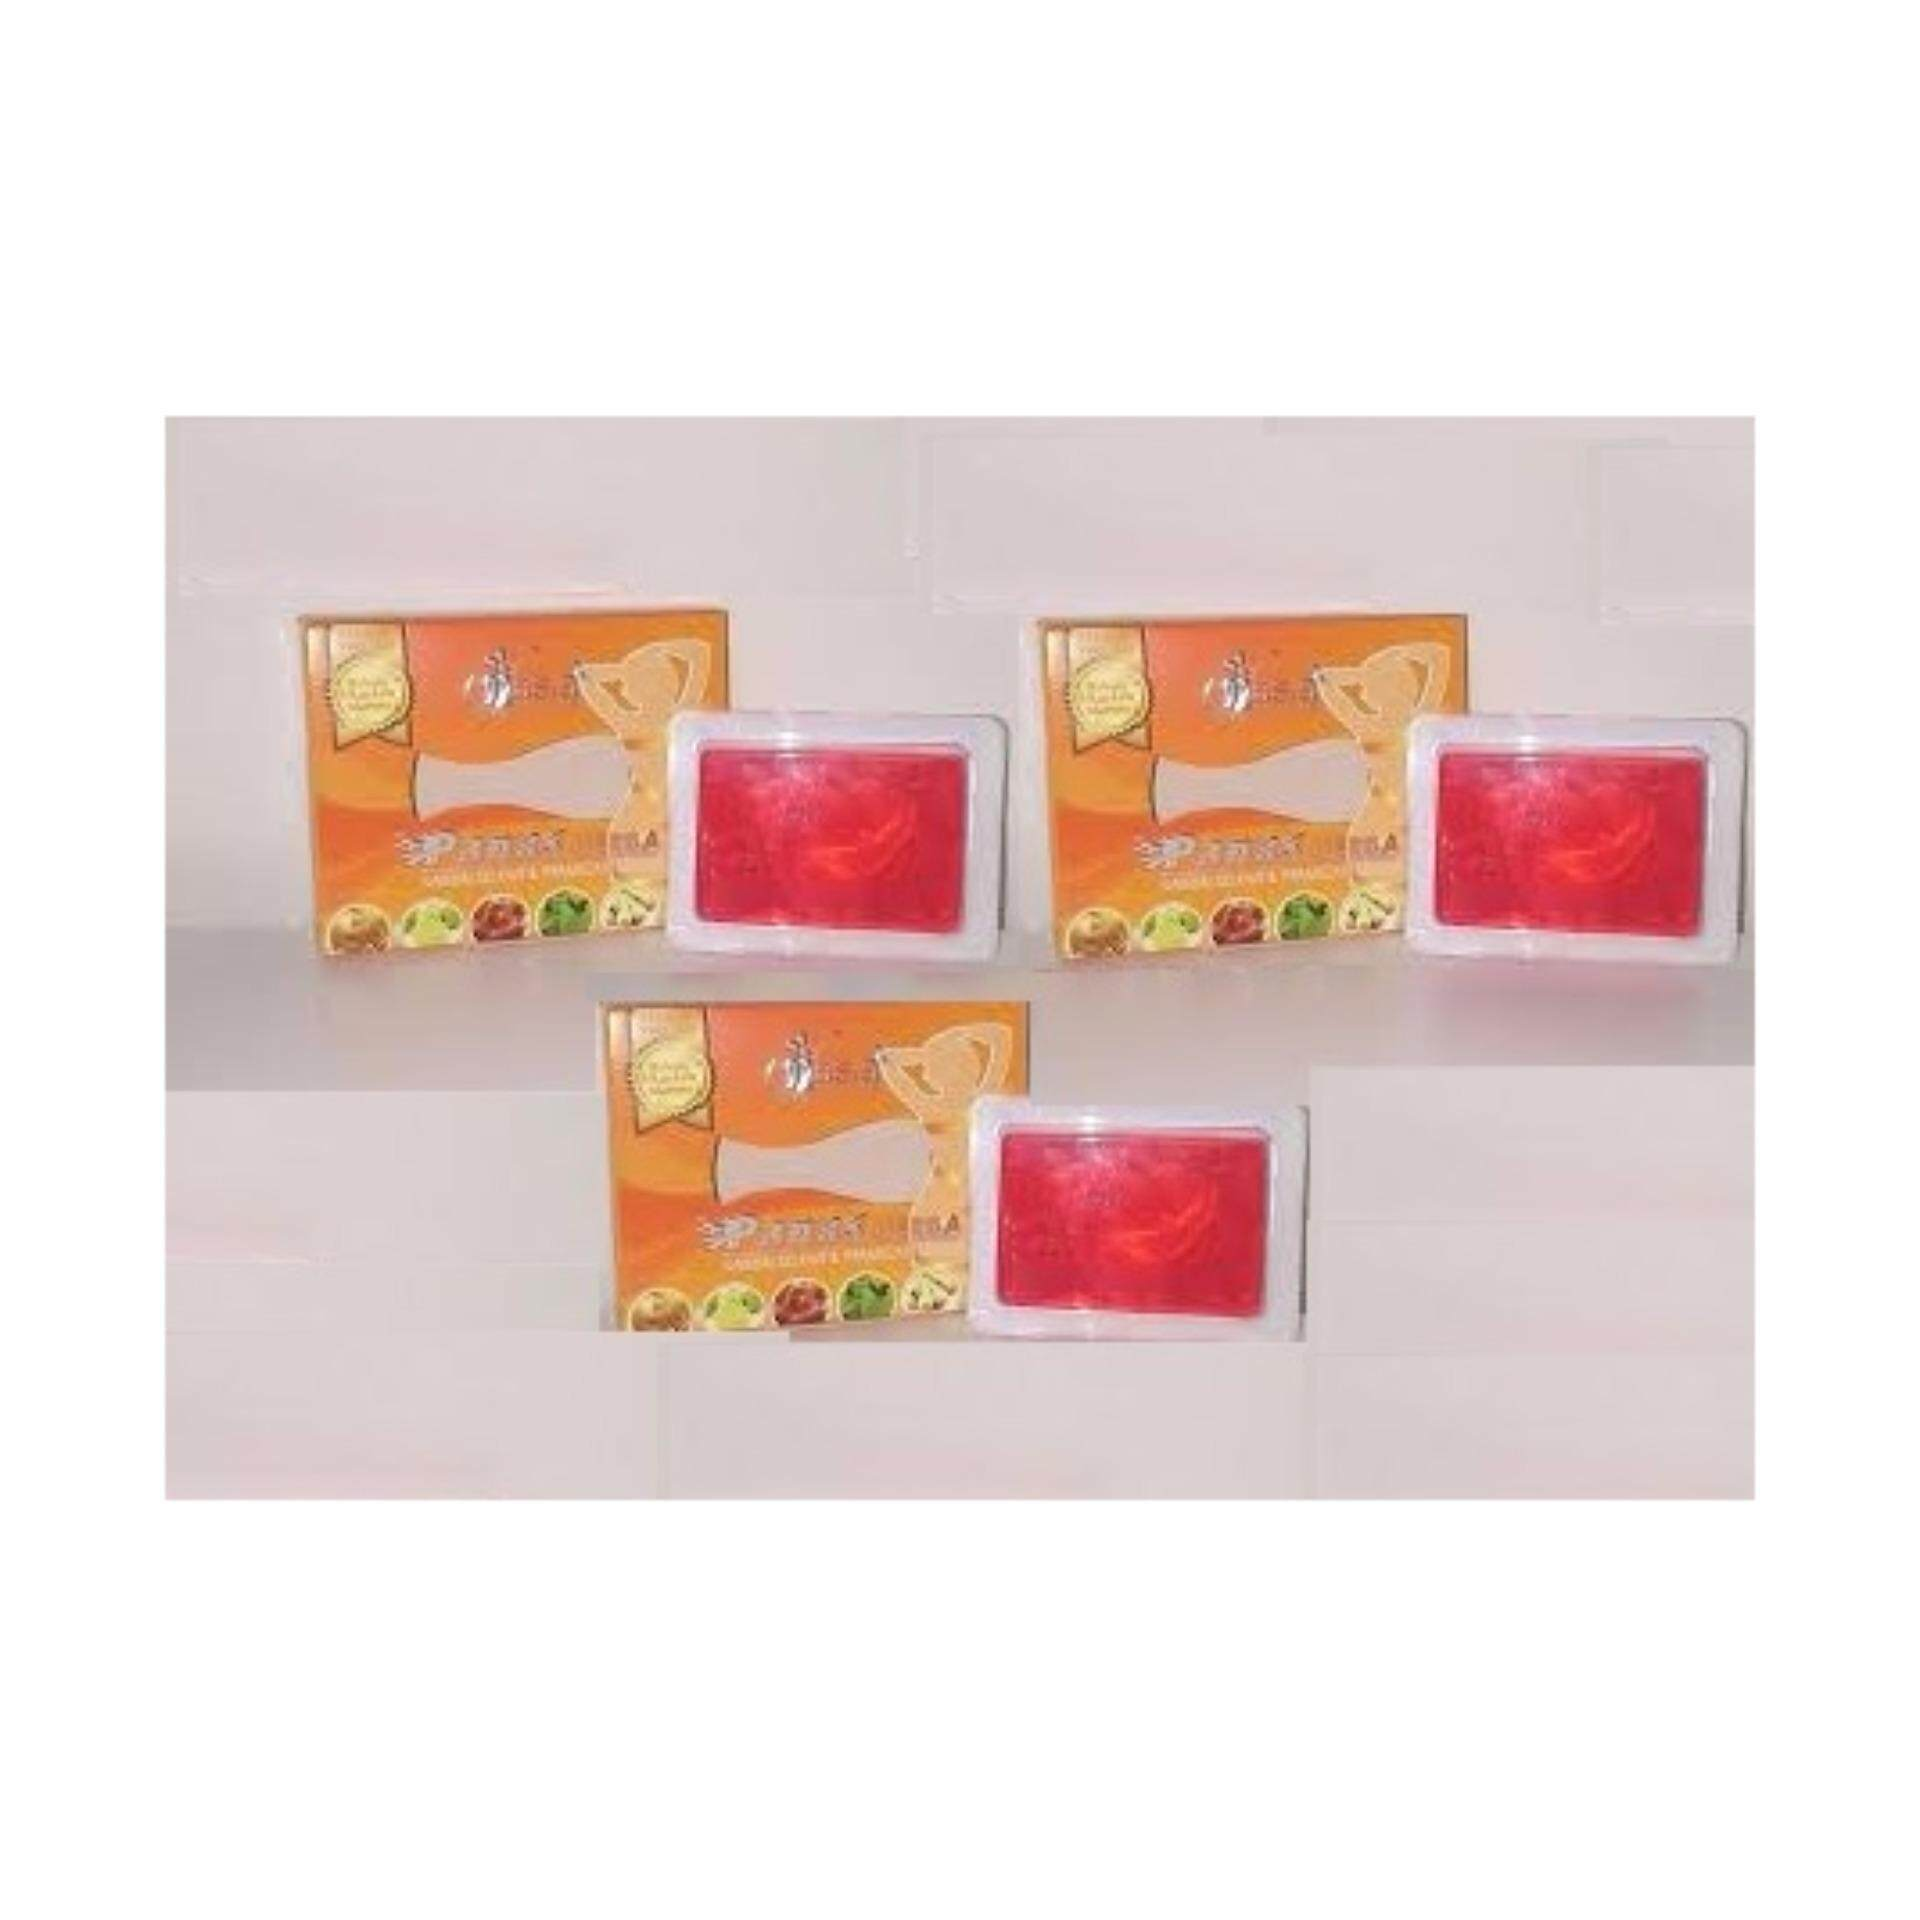 VAsia Hot Herbal Soap V\'Asia Sabun Panas Herba x 3 (Cellulite & Fats Soap)